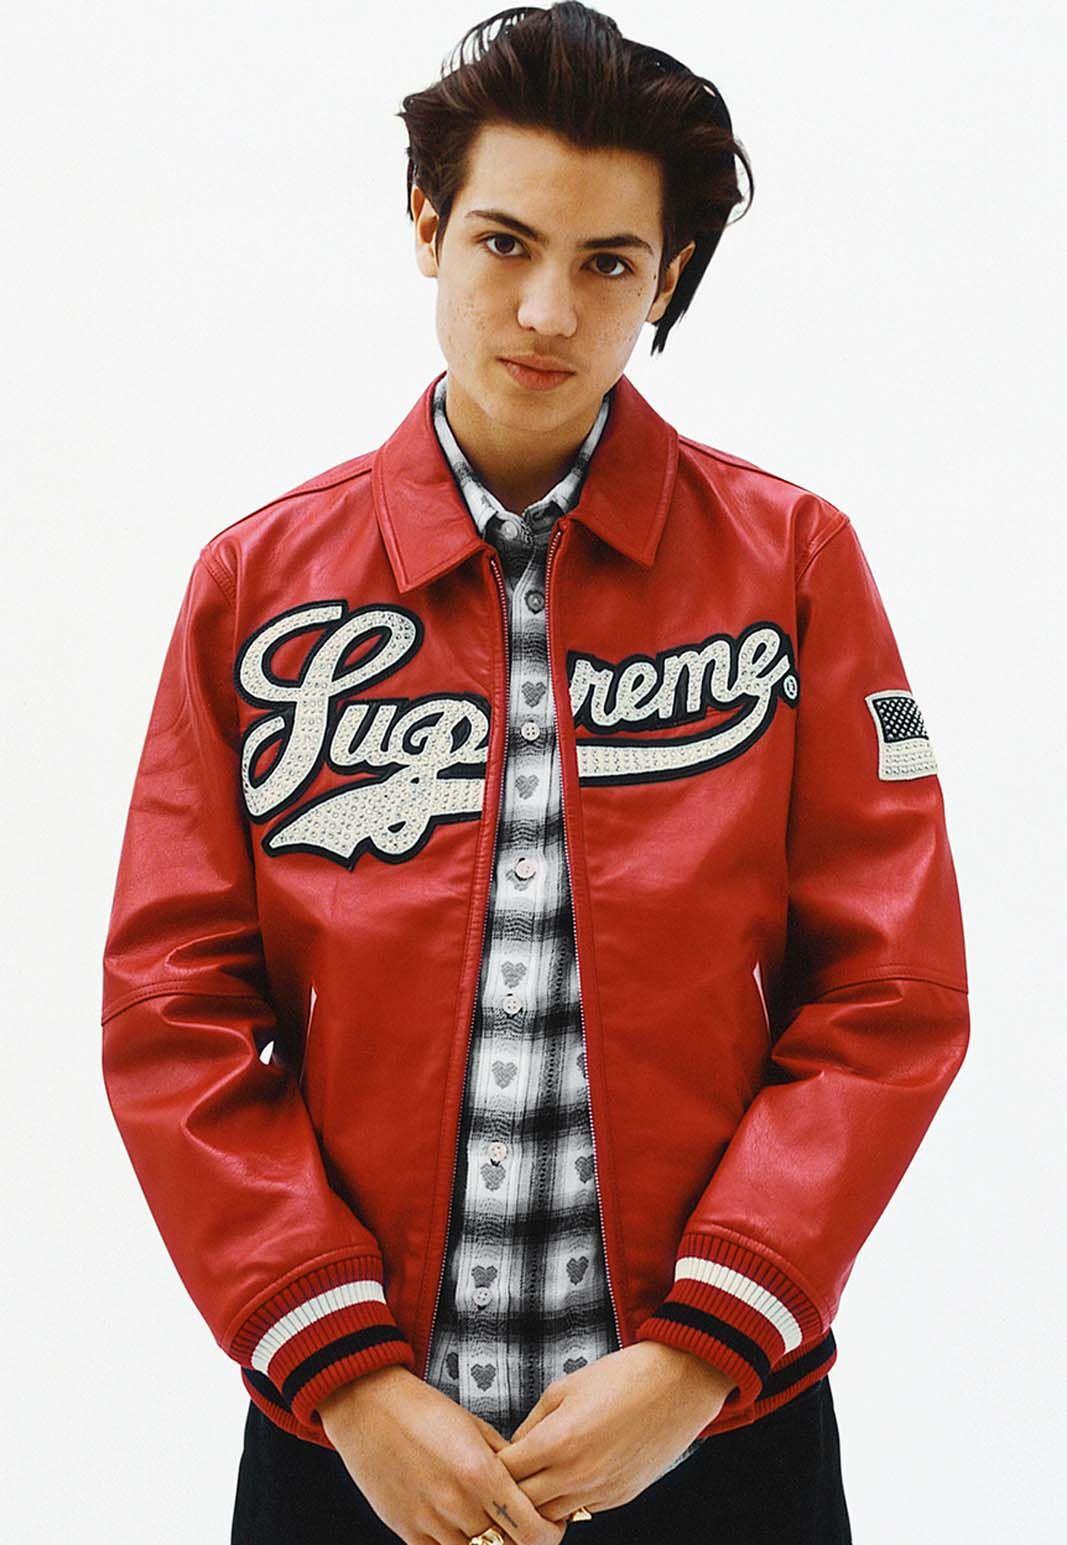 Leather jacket in summer - Supreme Spring Summer 2016 Uptown Studded Leather Varsity Jacket